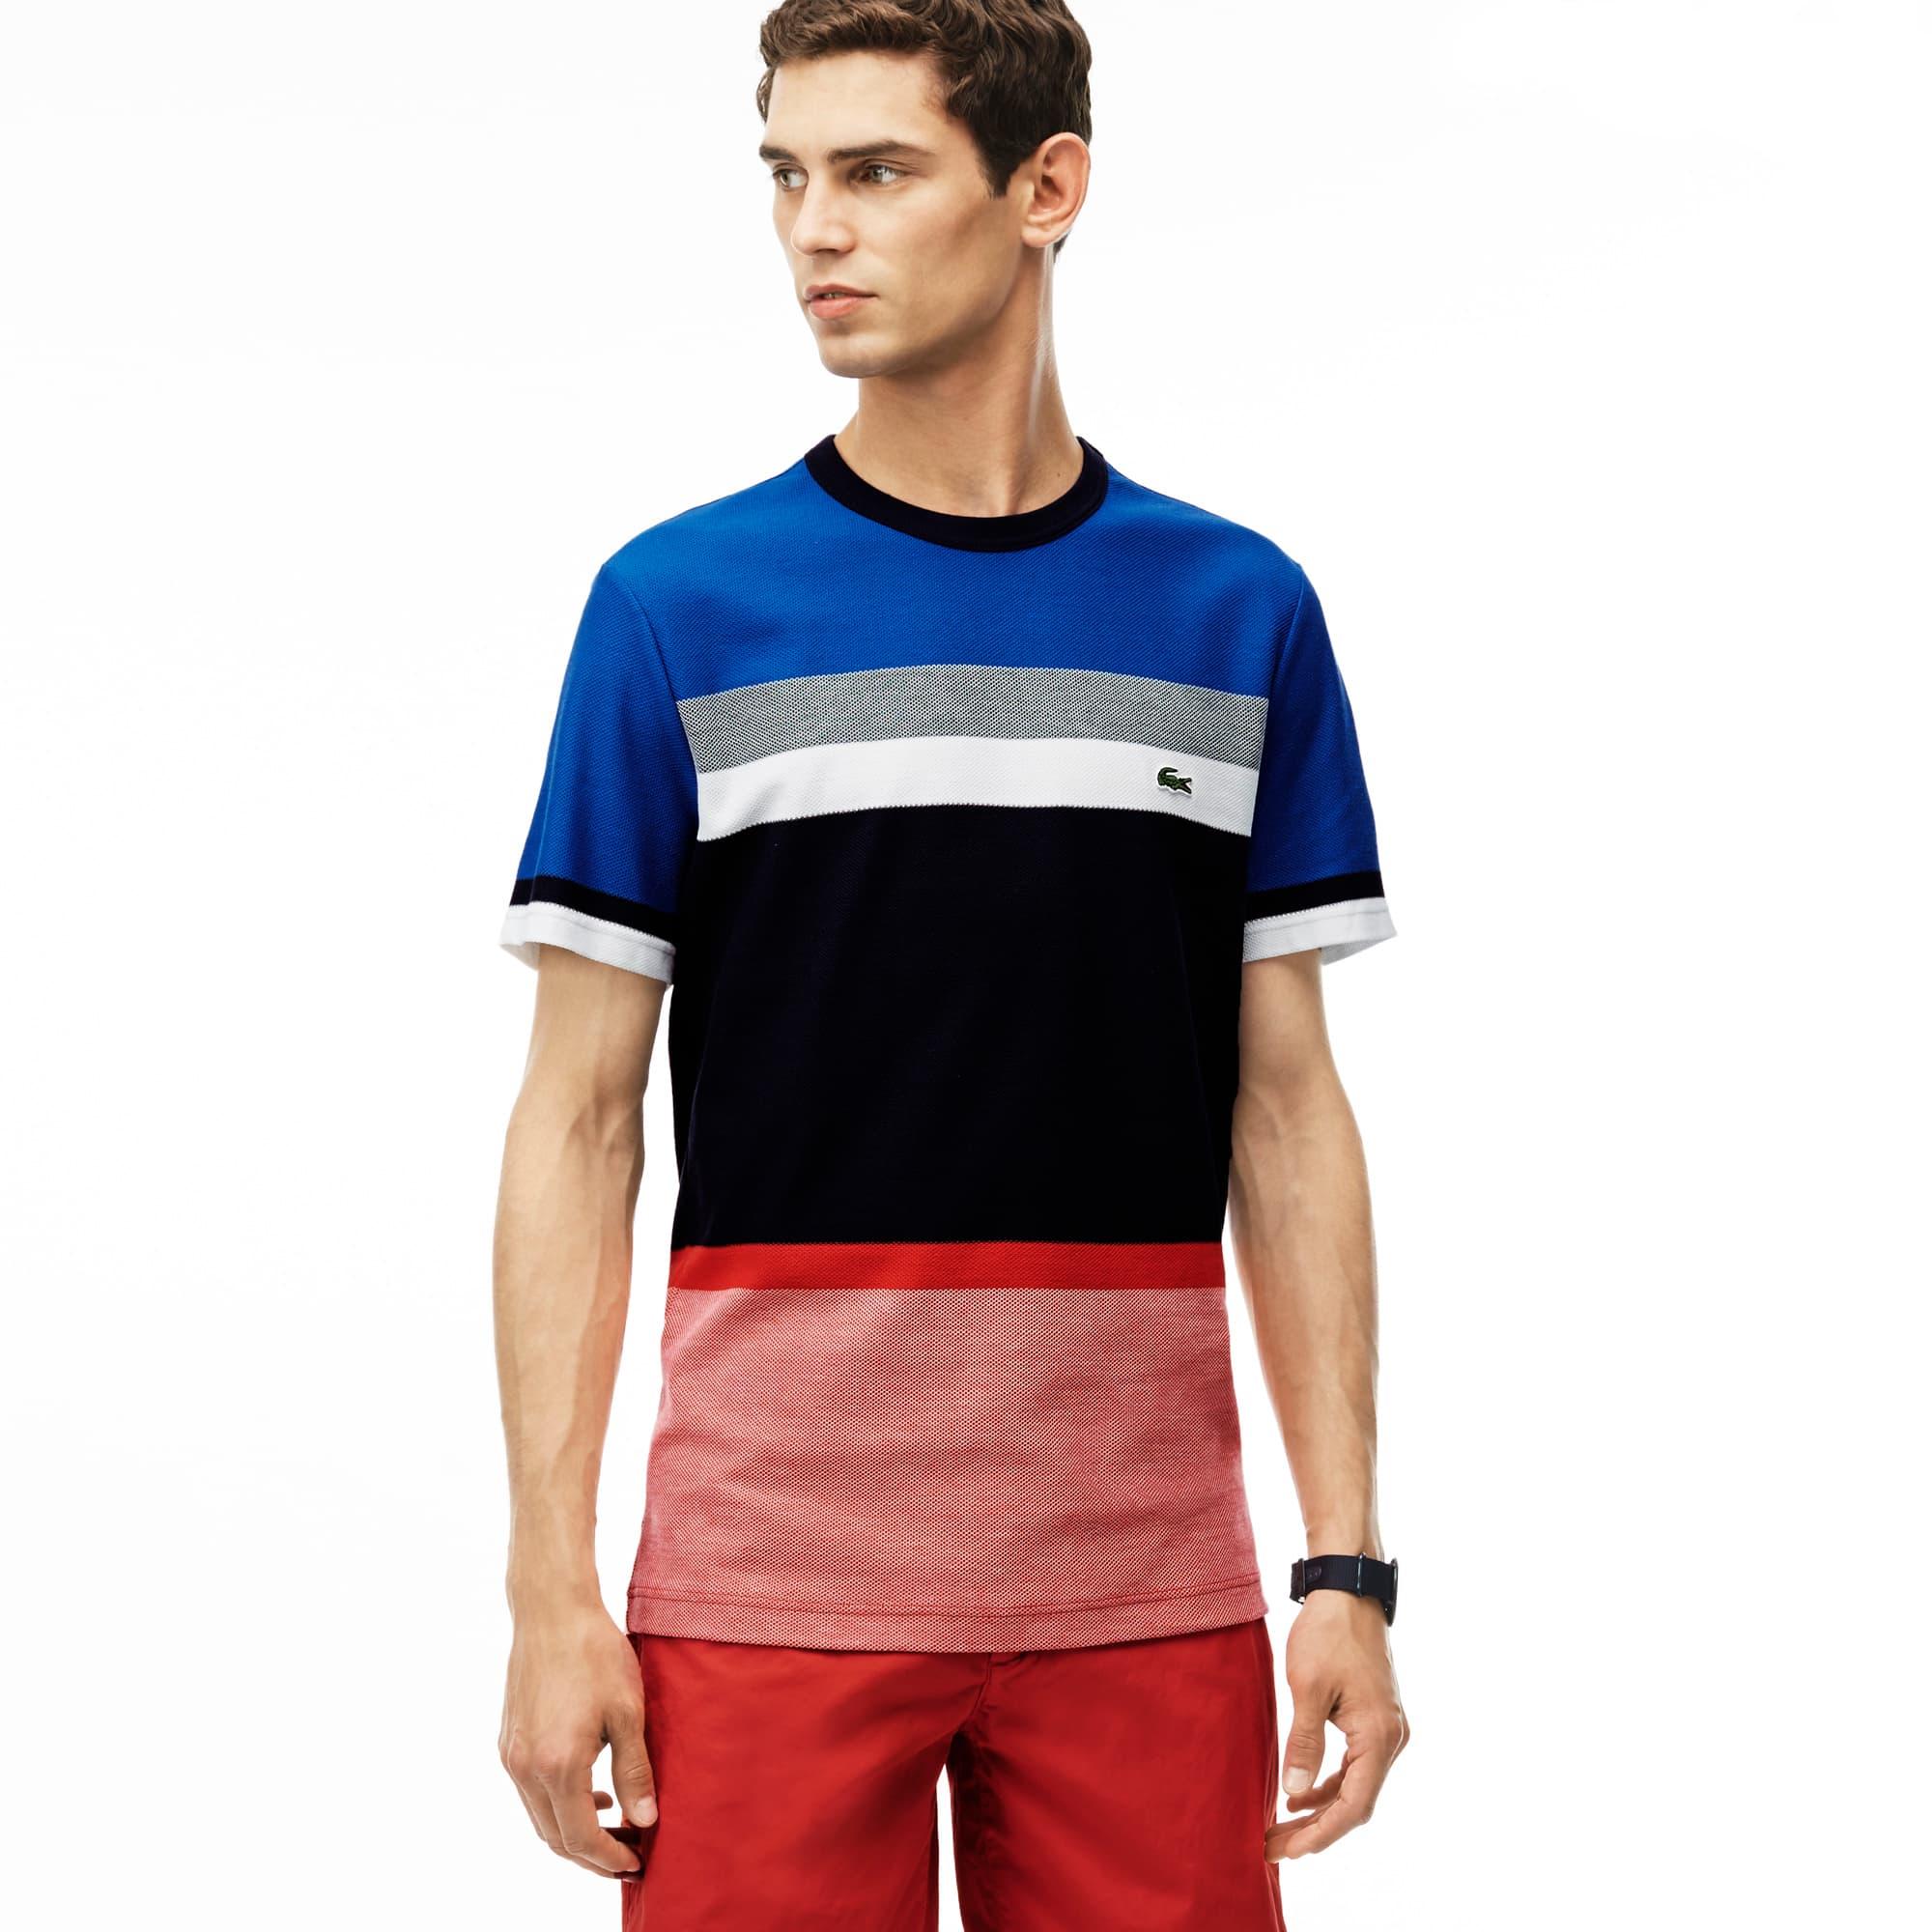 Men's Honeycomb Jersey Crew Neck Colorblock T-Shirt